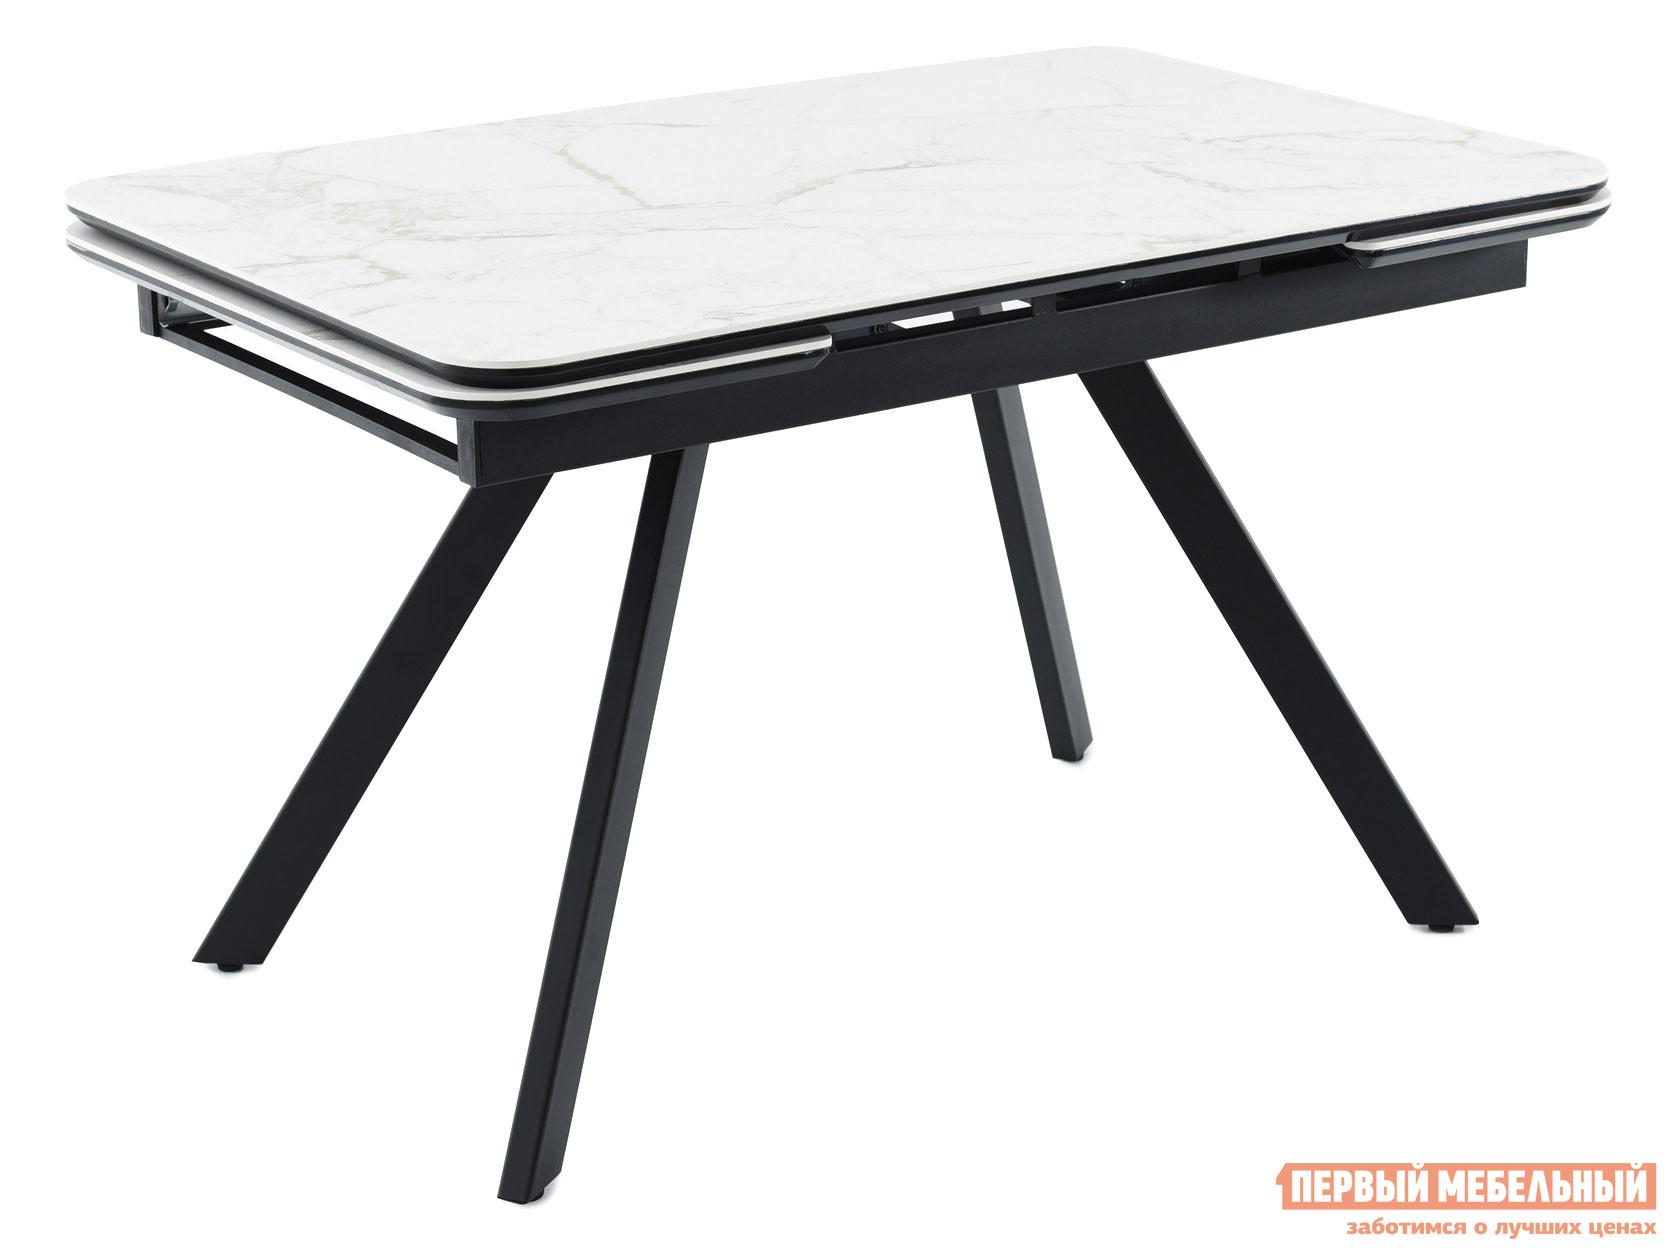 Кухонный стол  Леон Calacata vagli / Черный, металл Мебвилл 126812